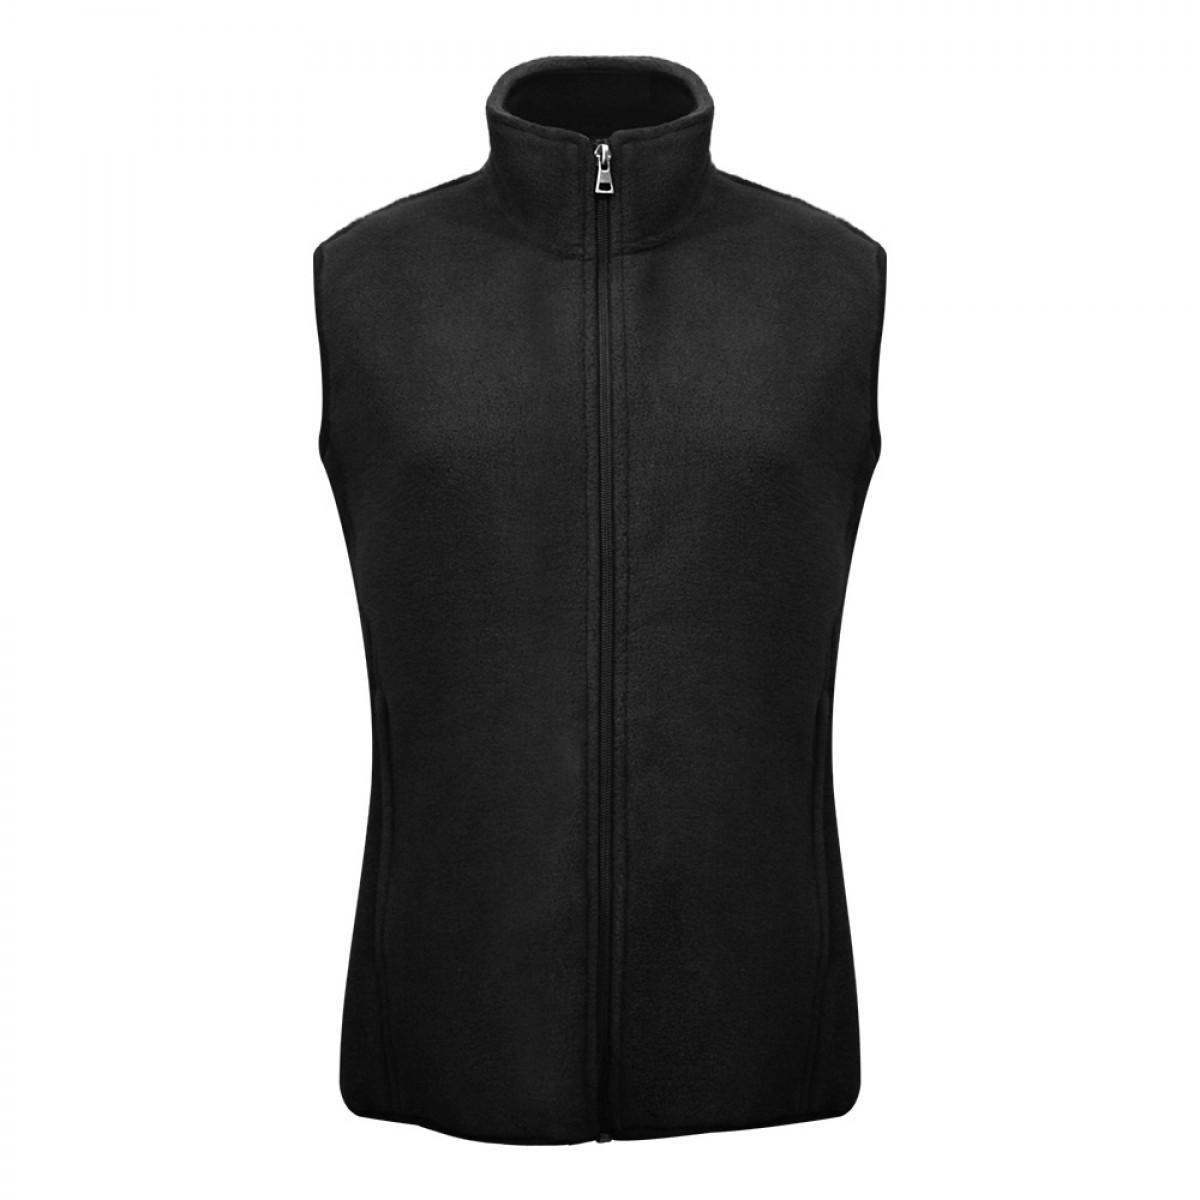 women-fleece-half-jacket-kfj96795-8a